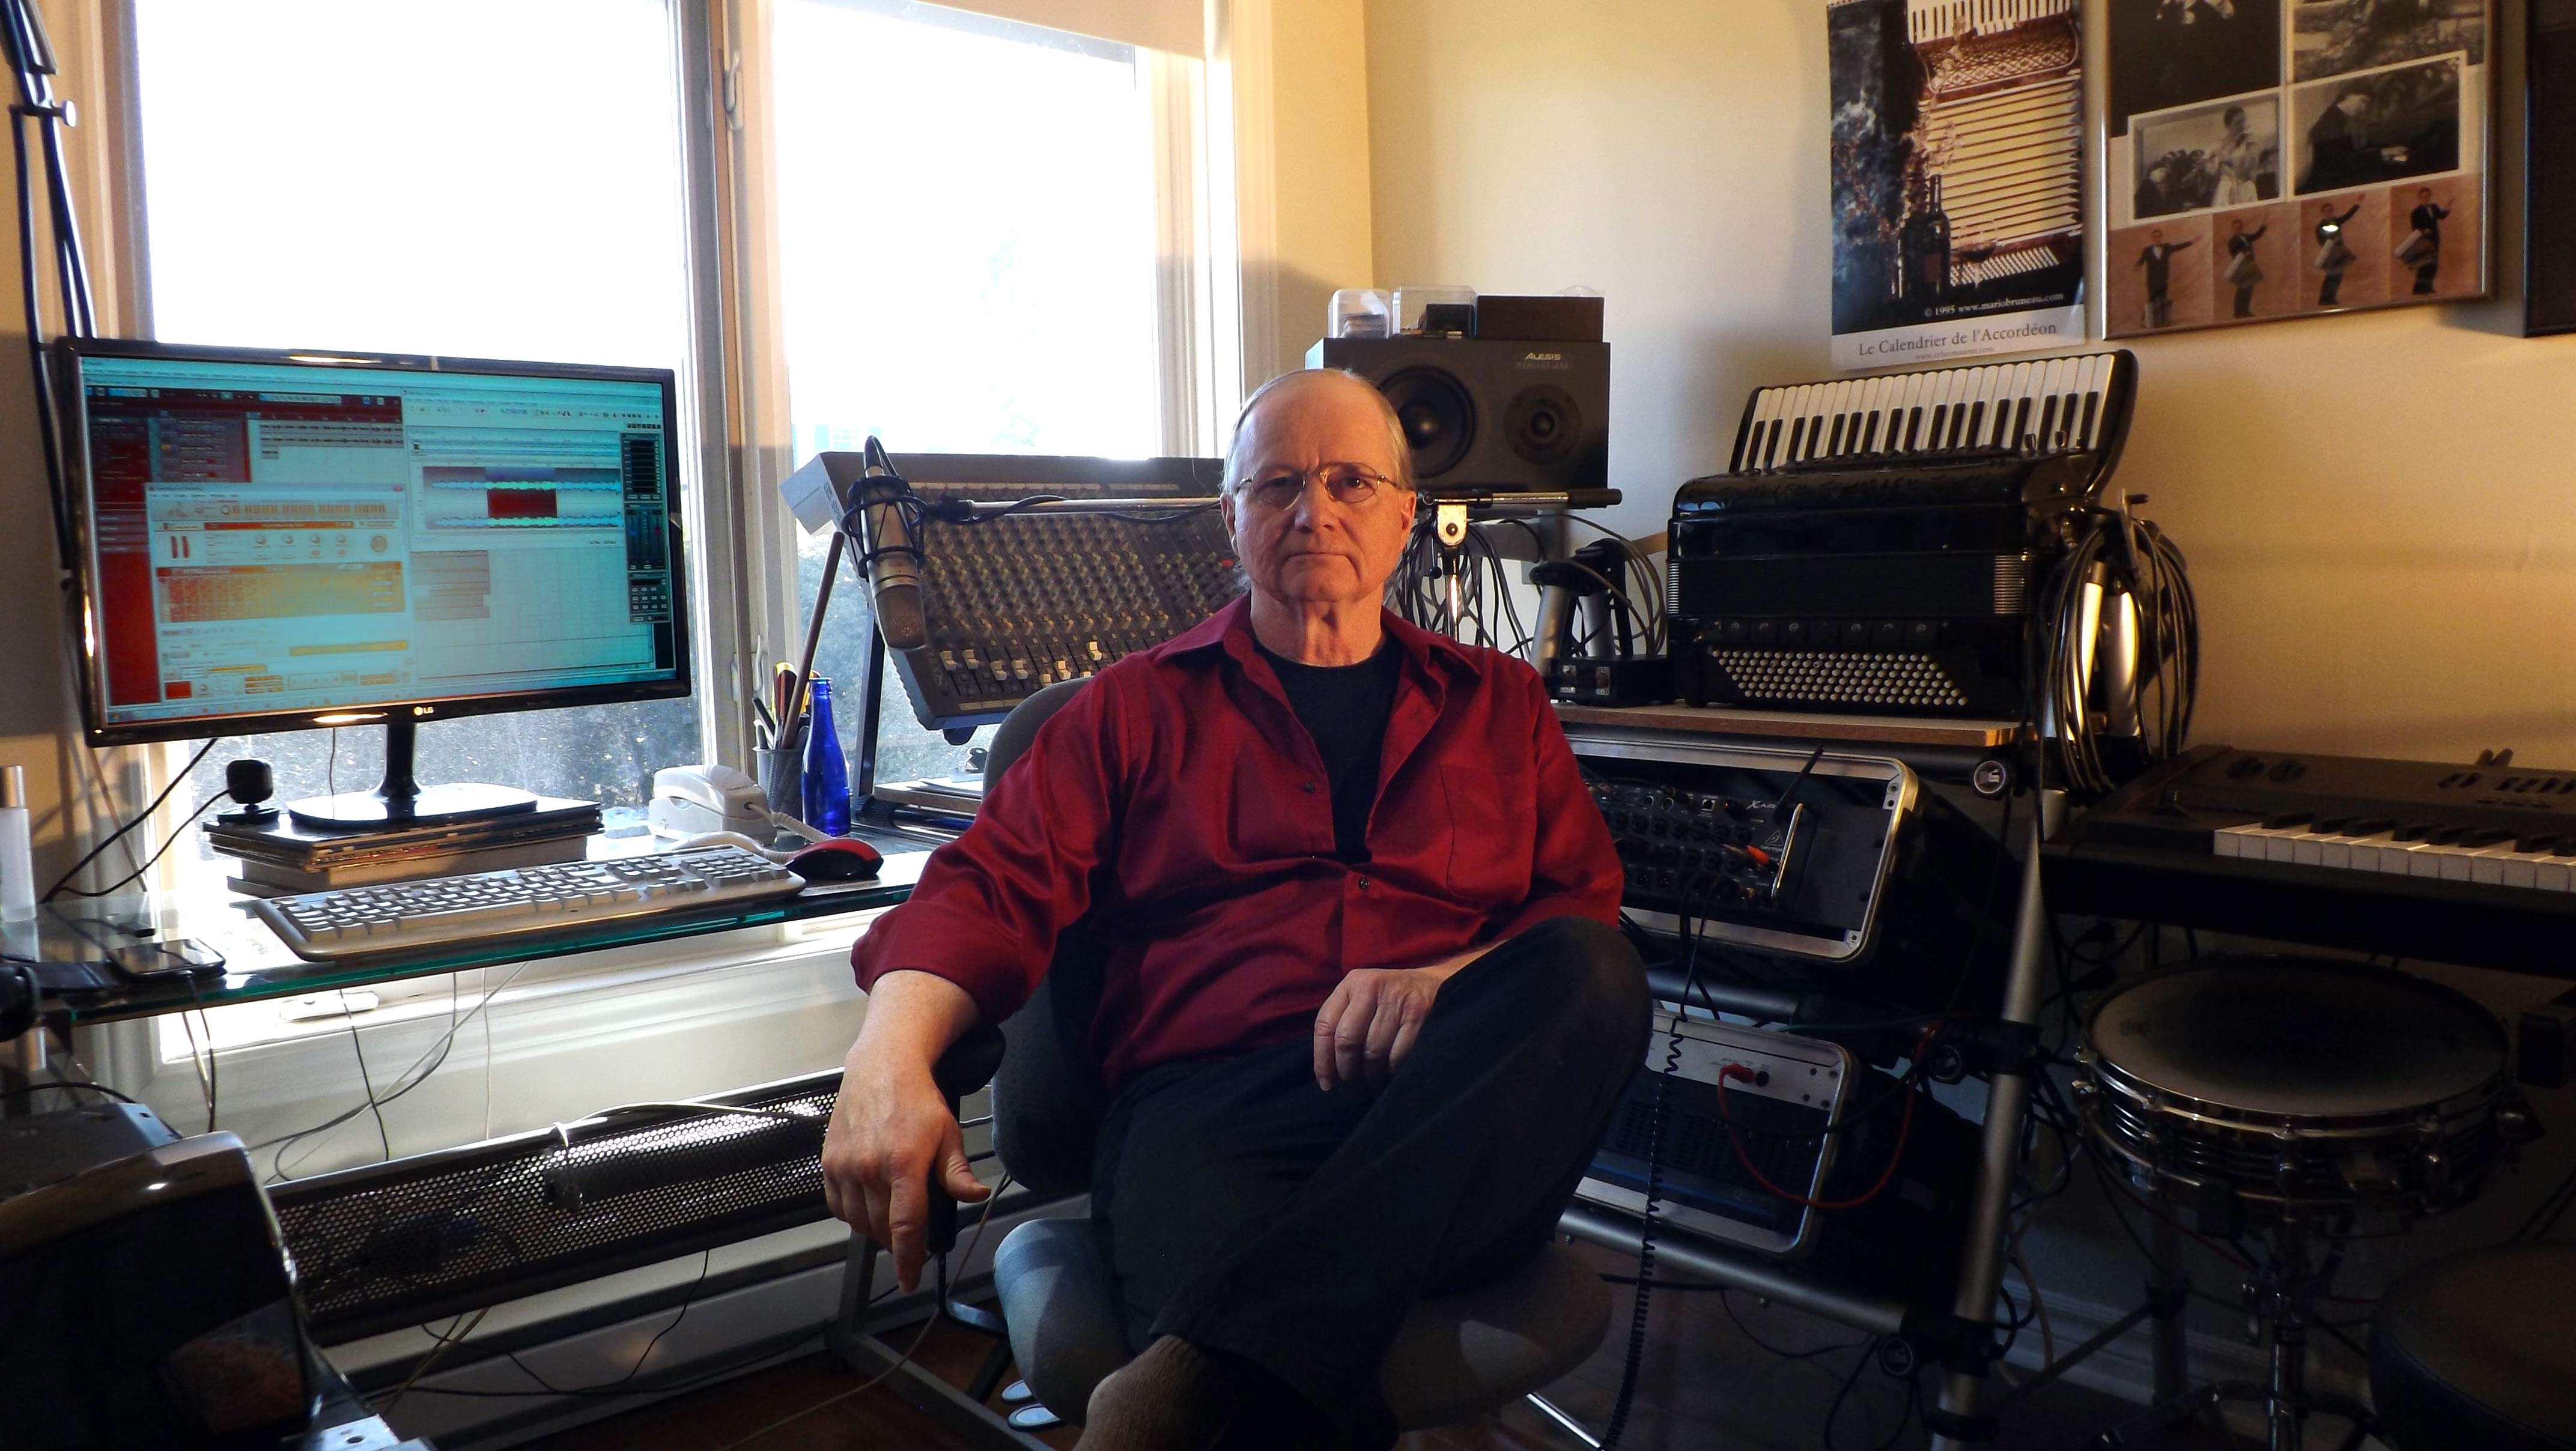 Studio de compositeur